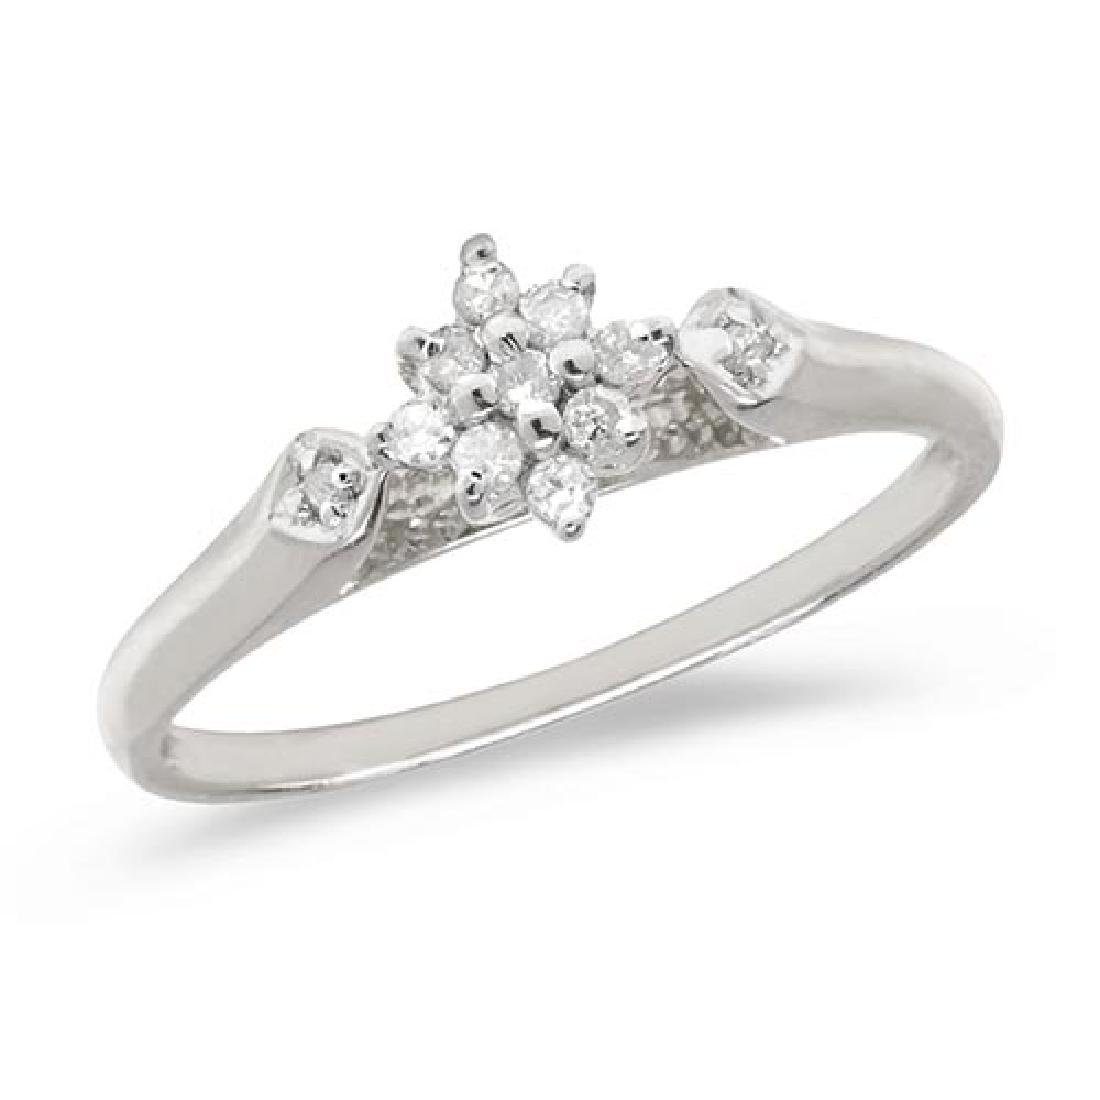 Certified 10K White Gold Diamond Cluster Ring